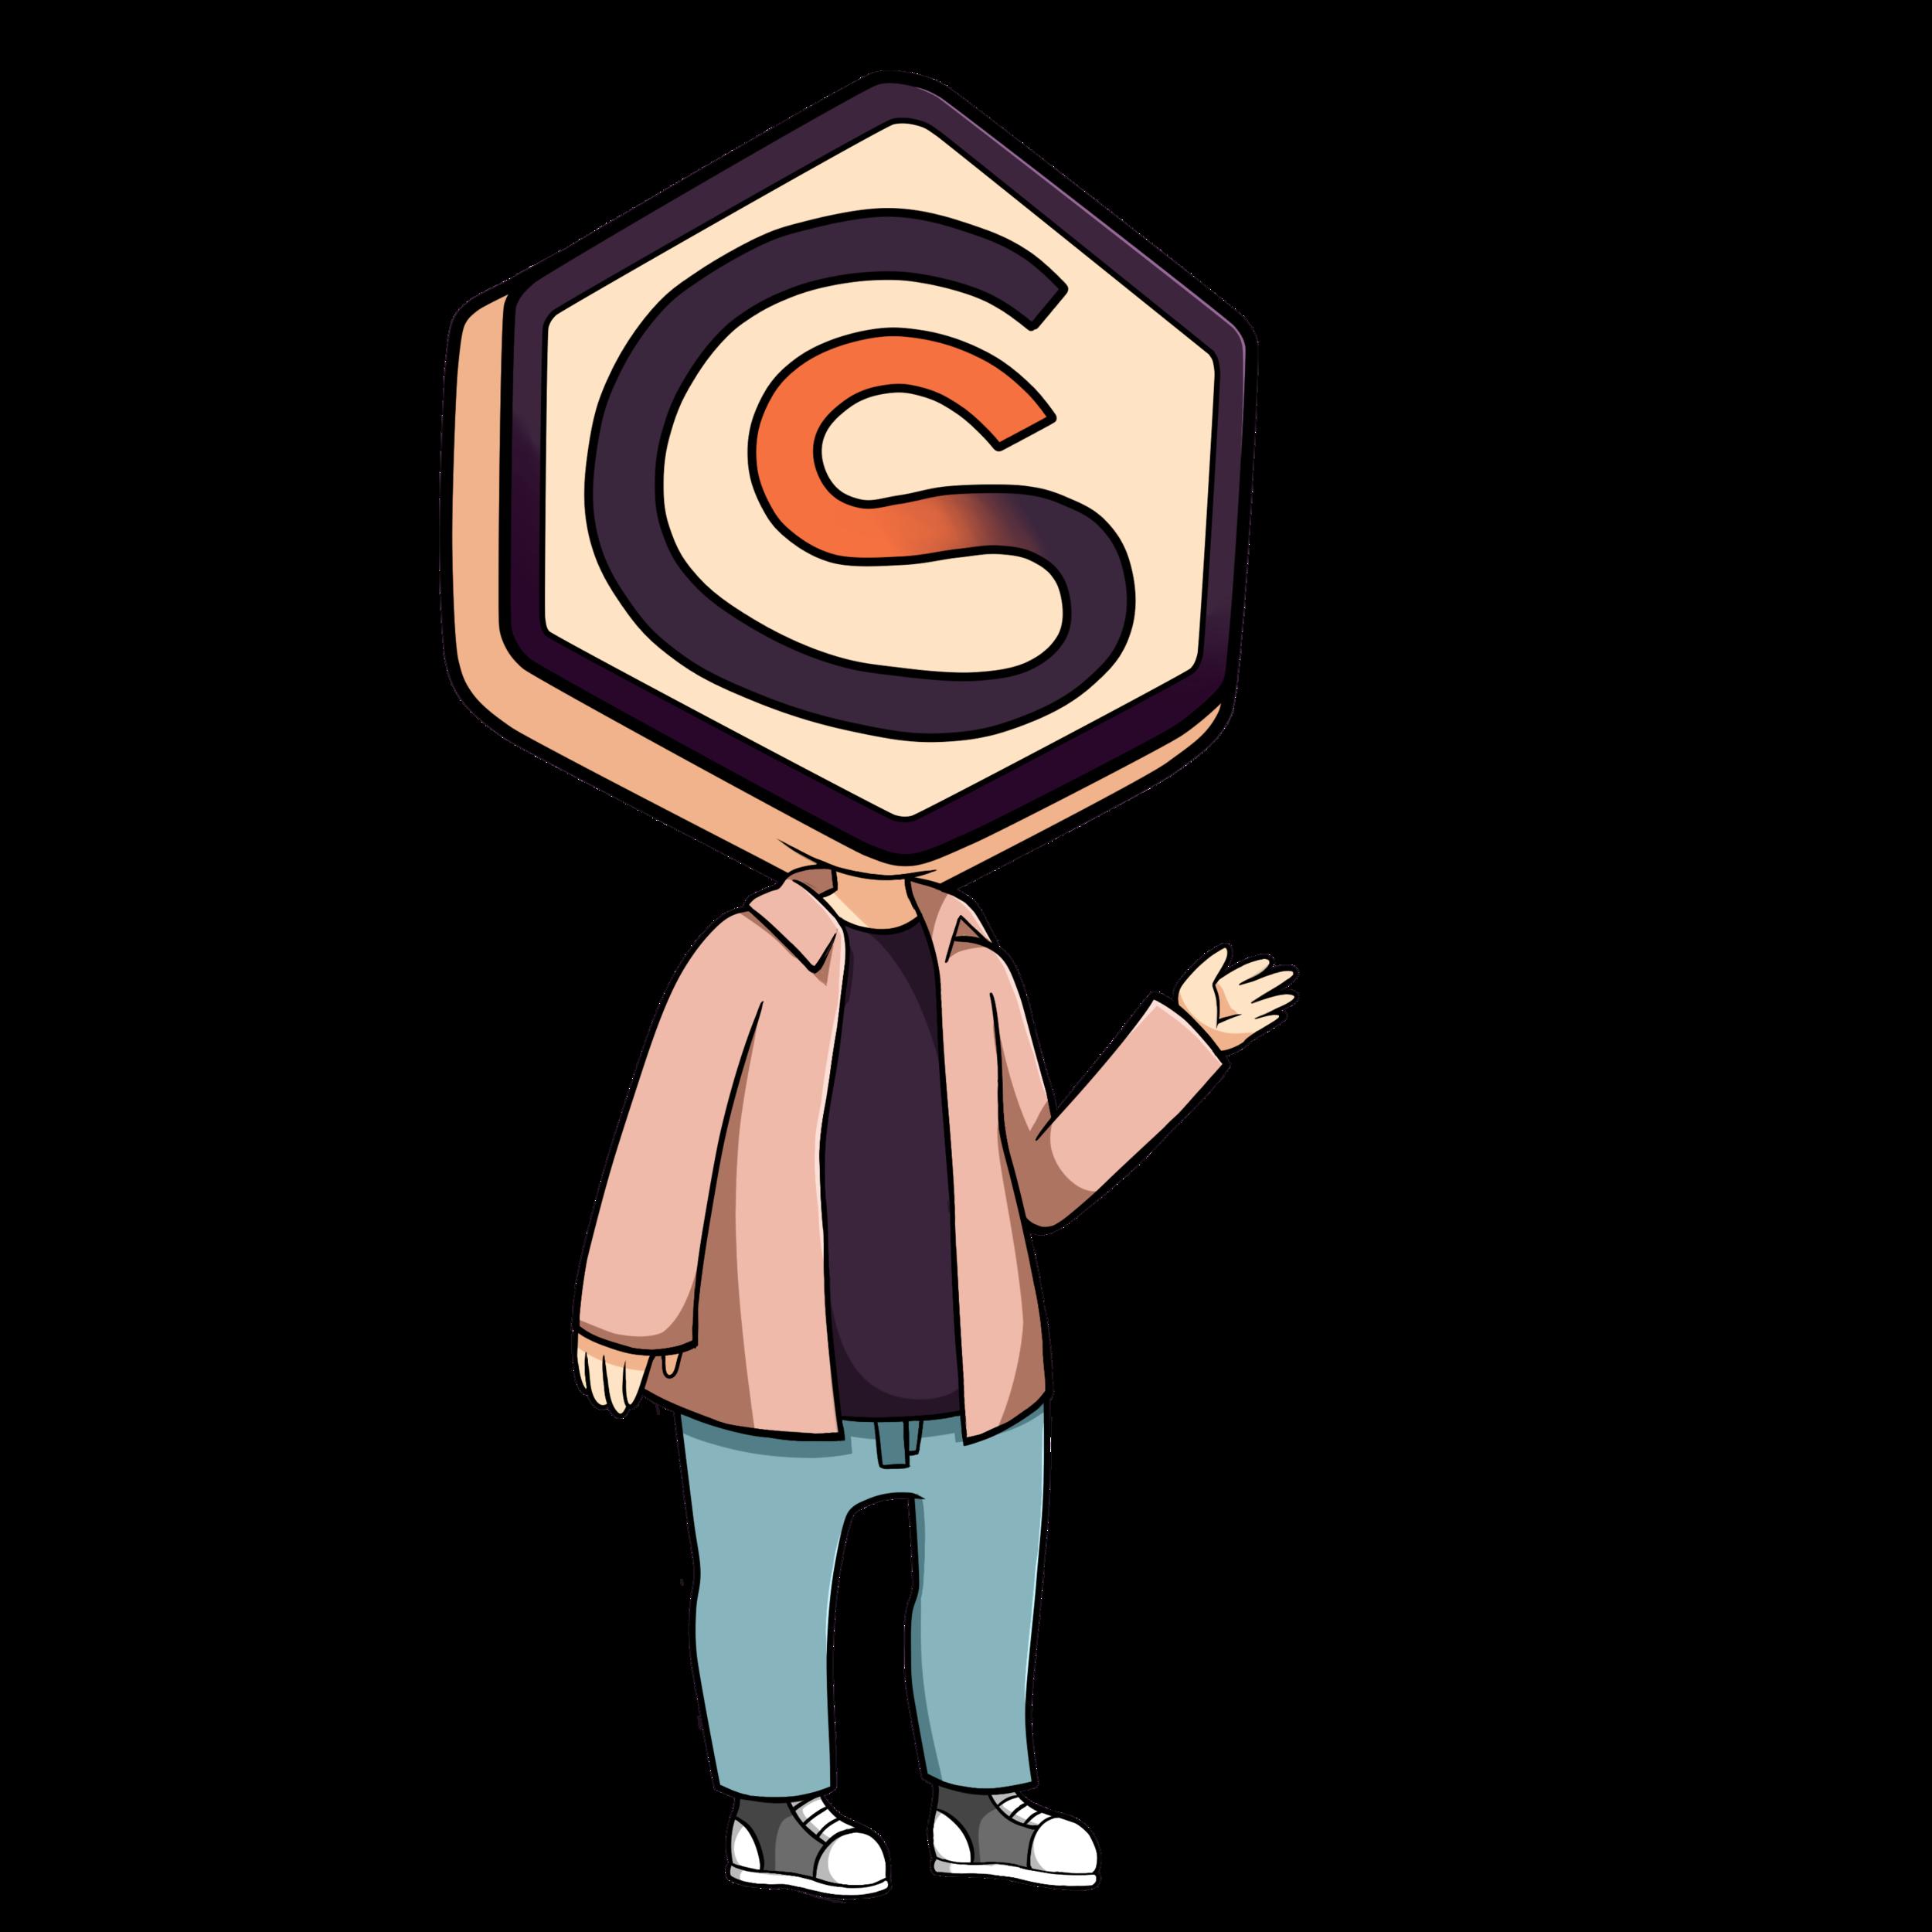 GamerSupply Chibi